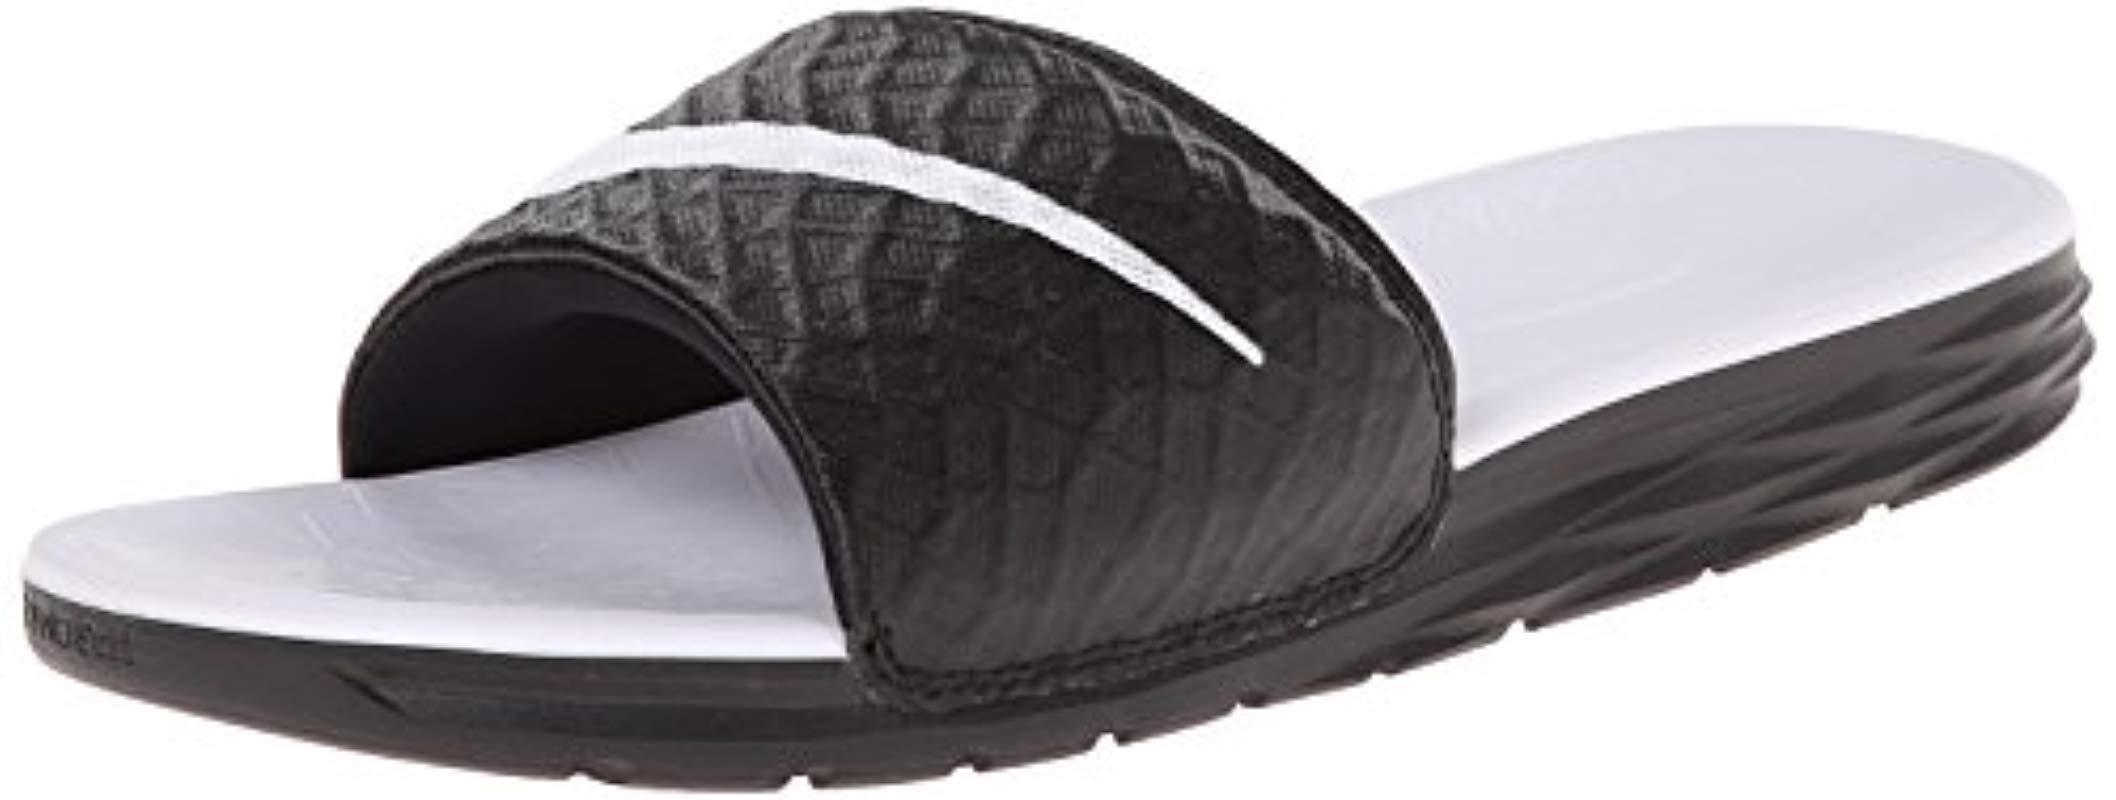 3ce3ec201471 Nike. Women s Black Wmns Benassi Solarsoft